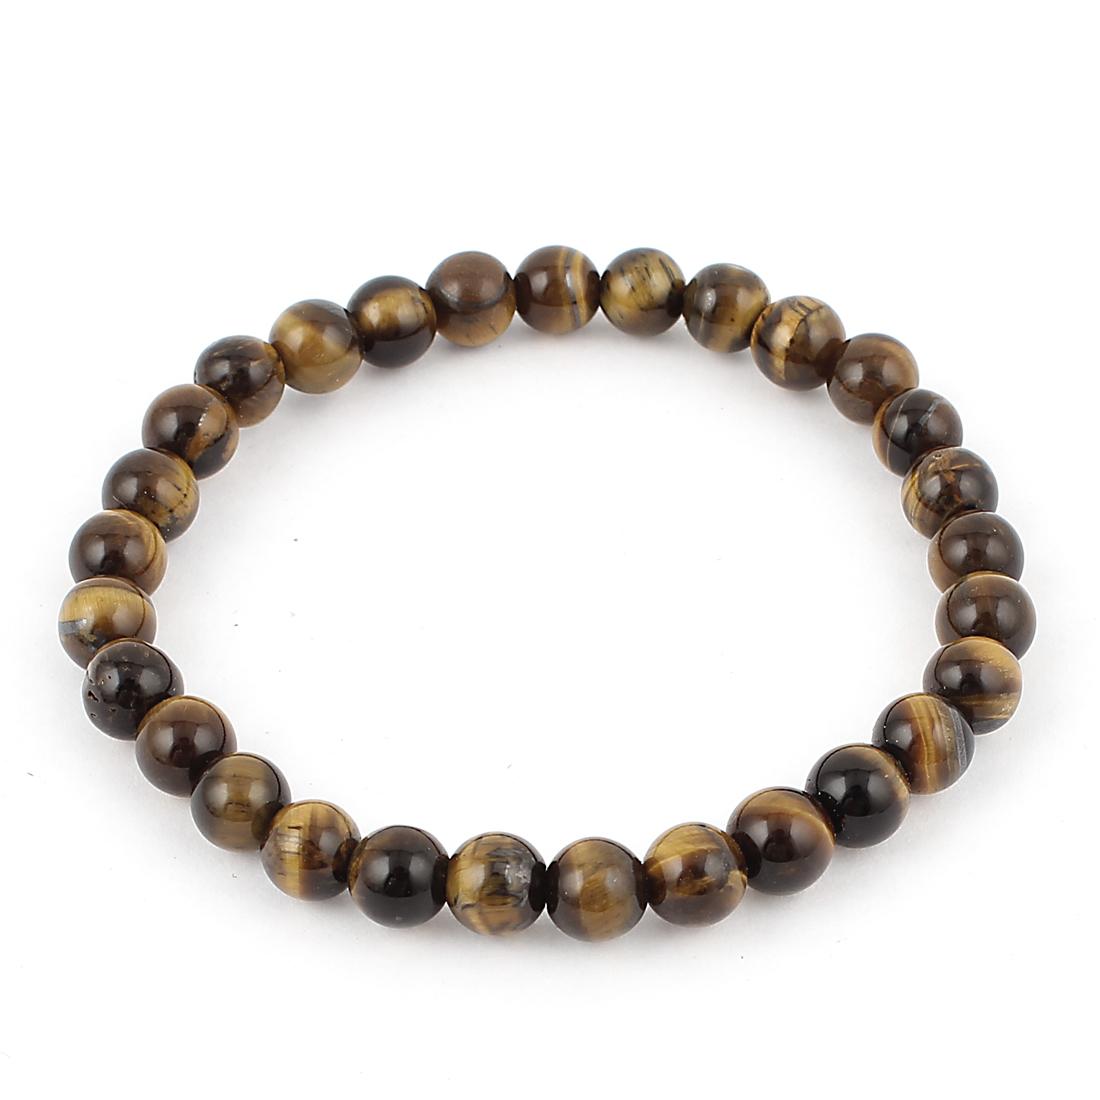 Lady Women Round Faux Jade Beads Decor Elastic Wrist Bangle Bracelet Black Yellow